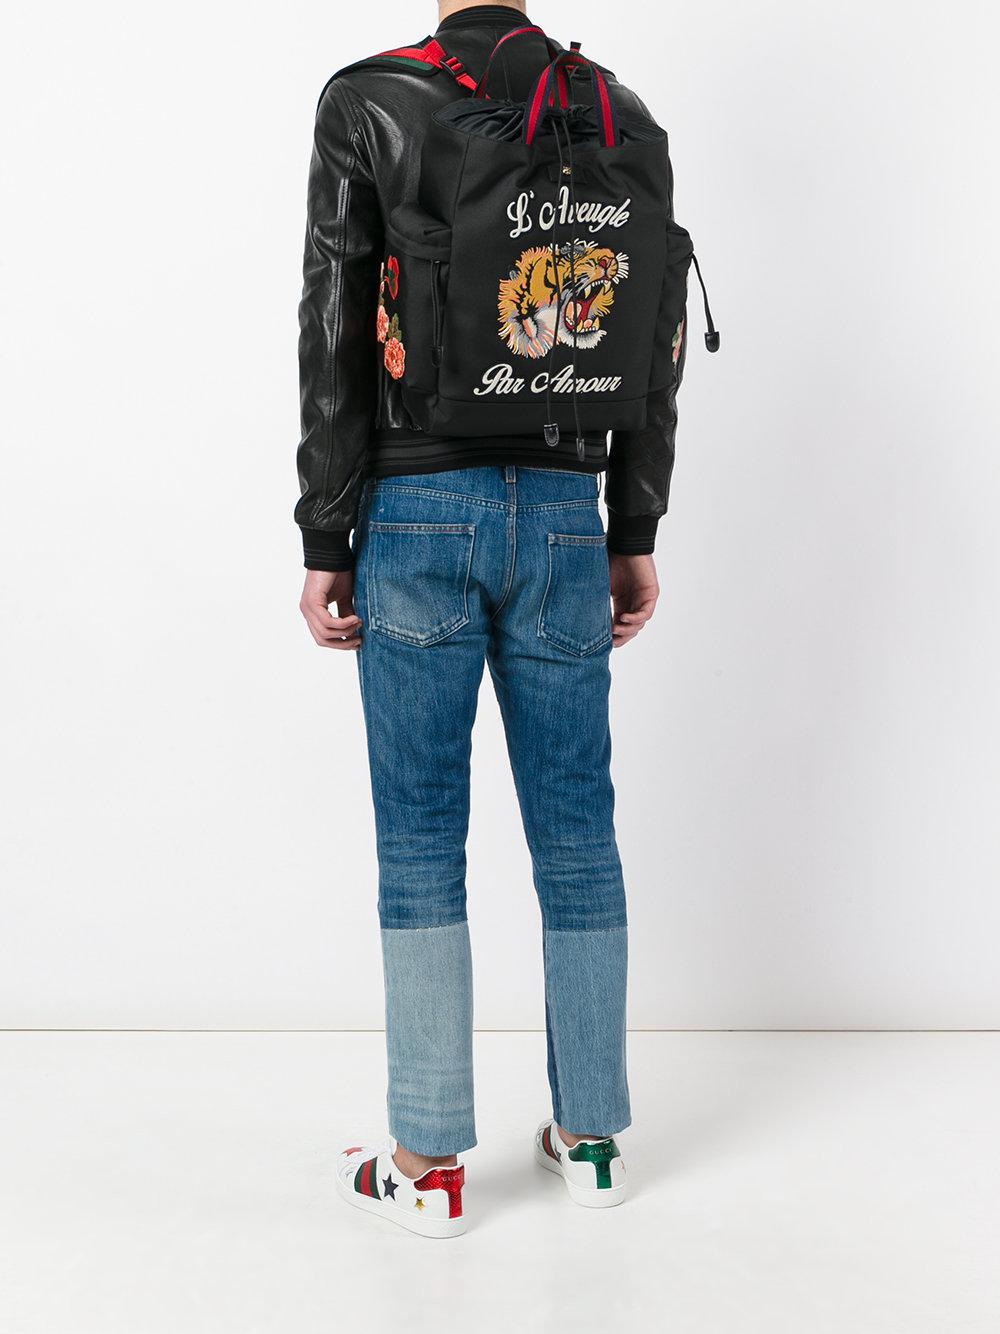 Gucci L Aveugle Par Amour Backpack In Black For Men Lyst